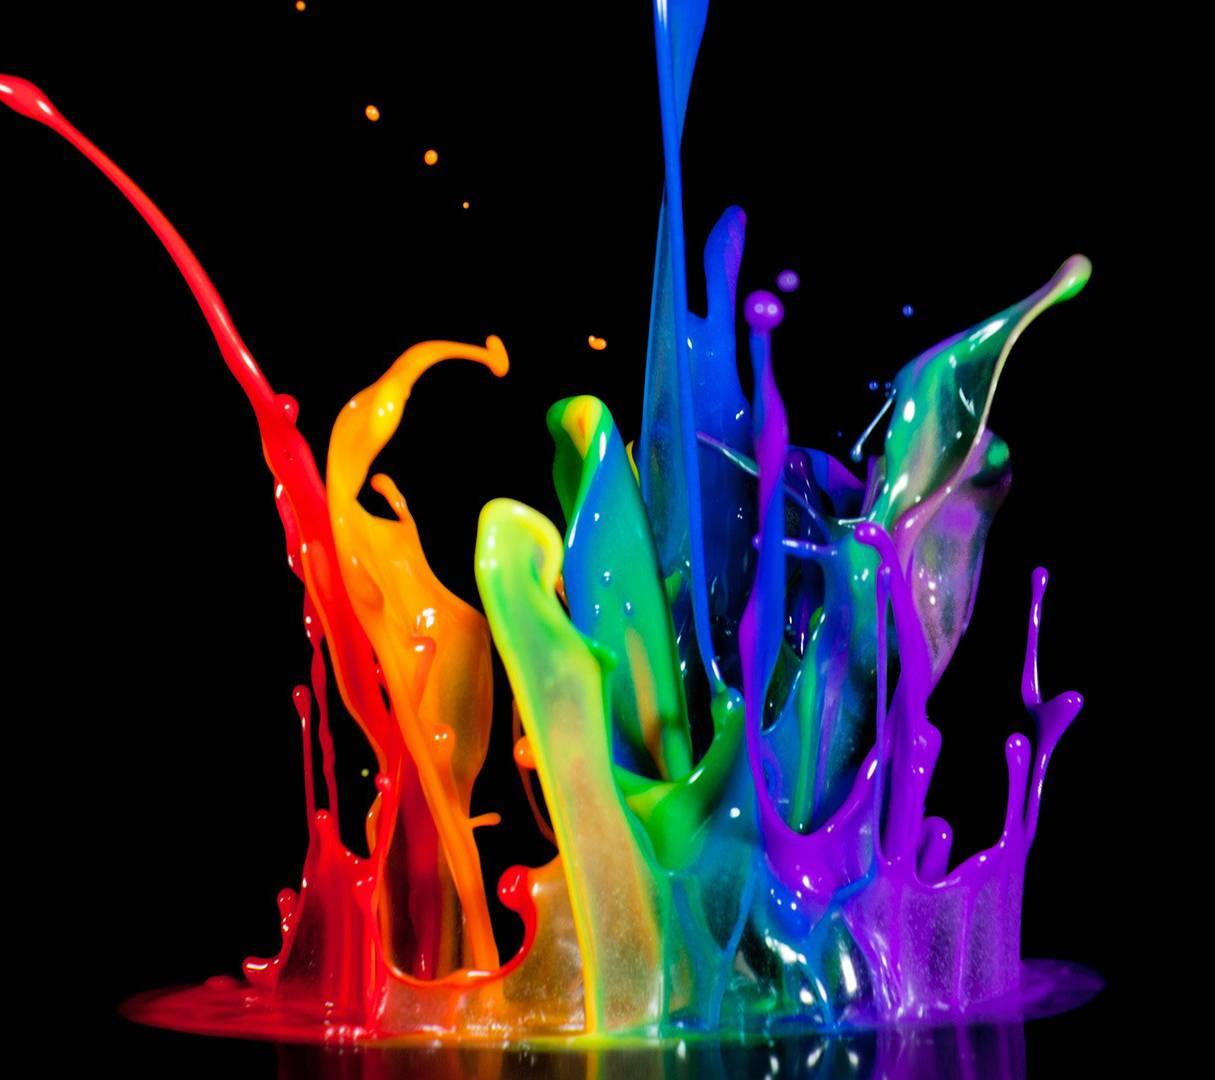 Color Splash Wallpaper By RamEzio